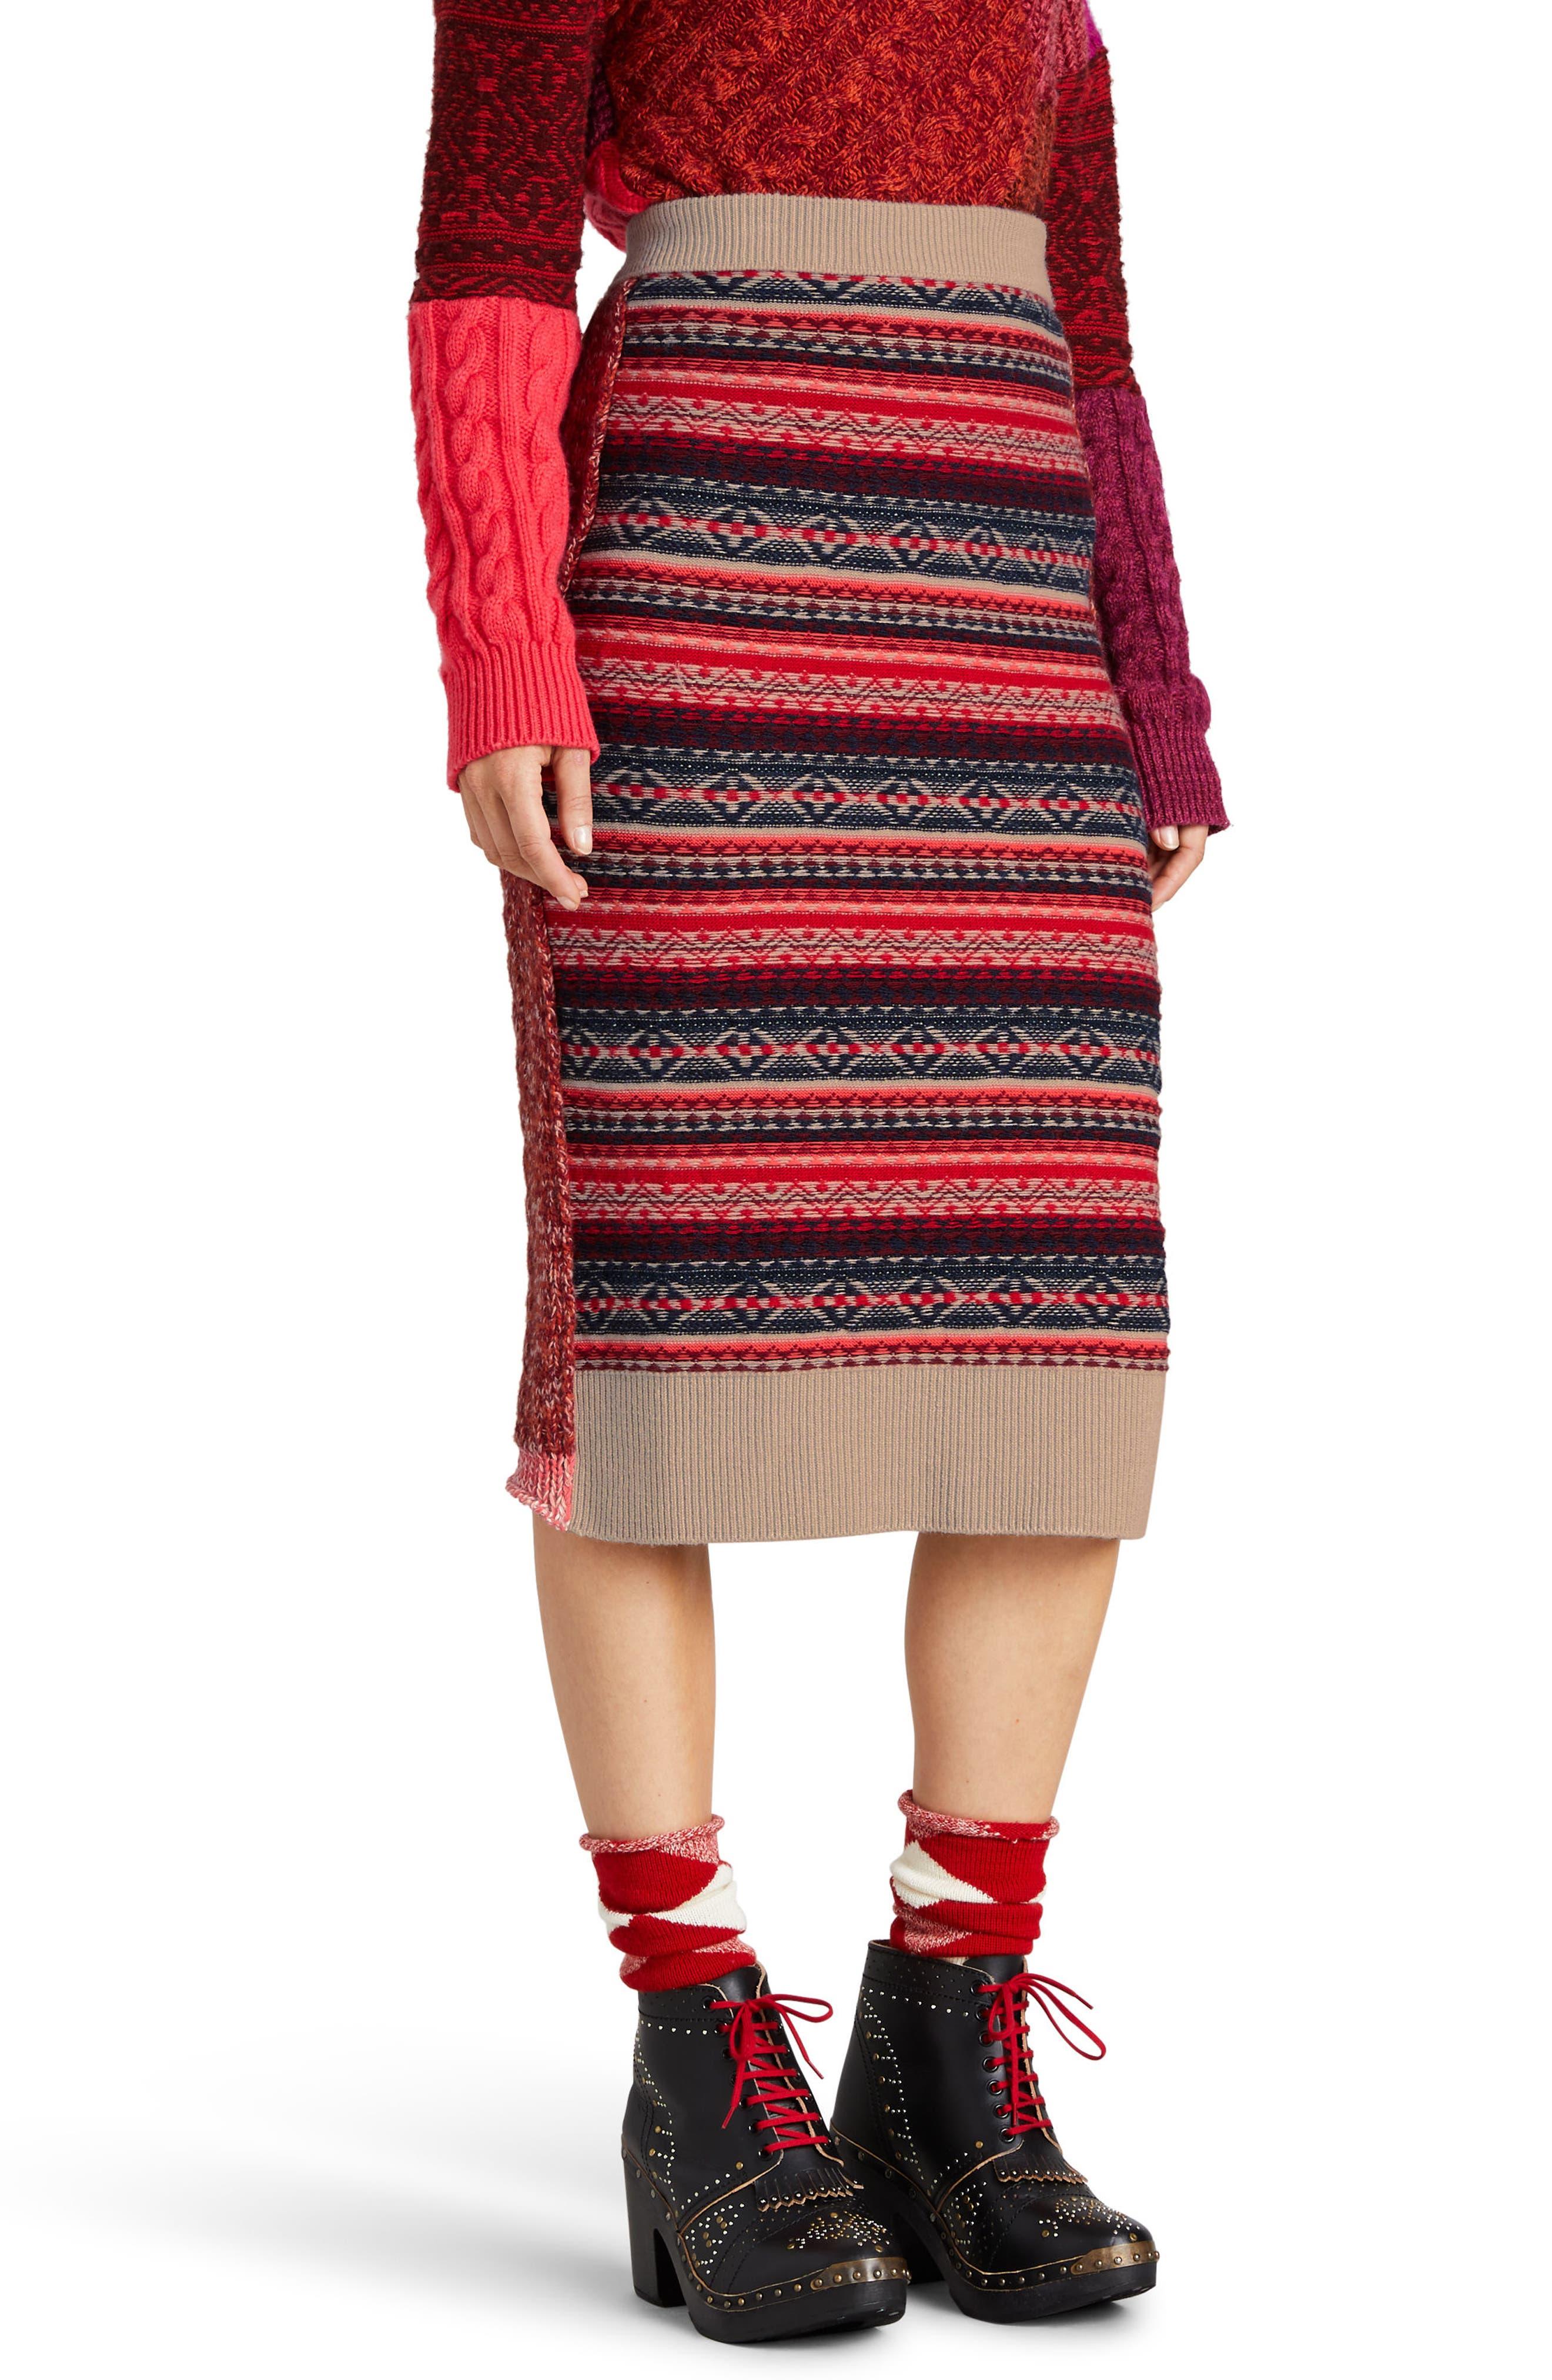 Main Image - Burberry Knit Wool Blend Pencil Skirt